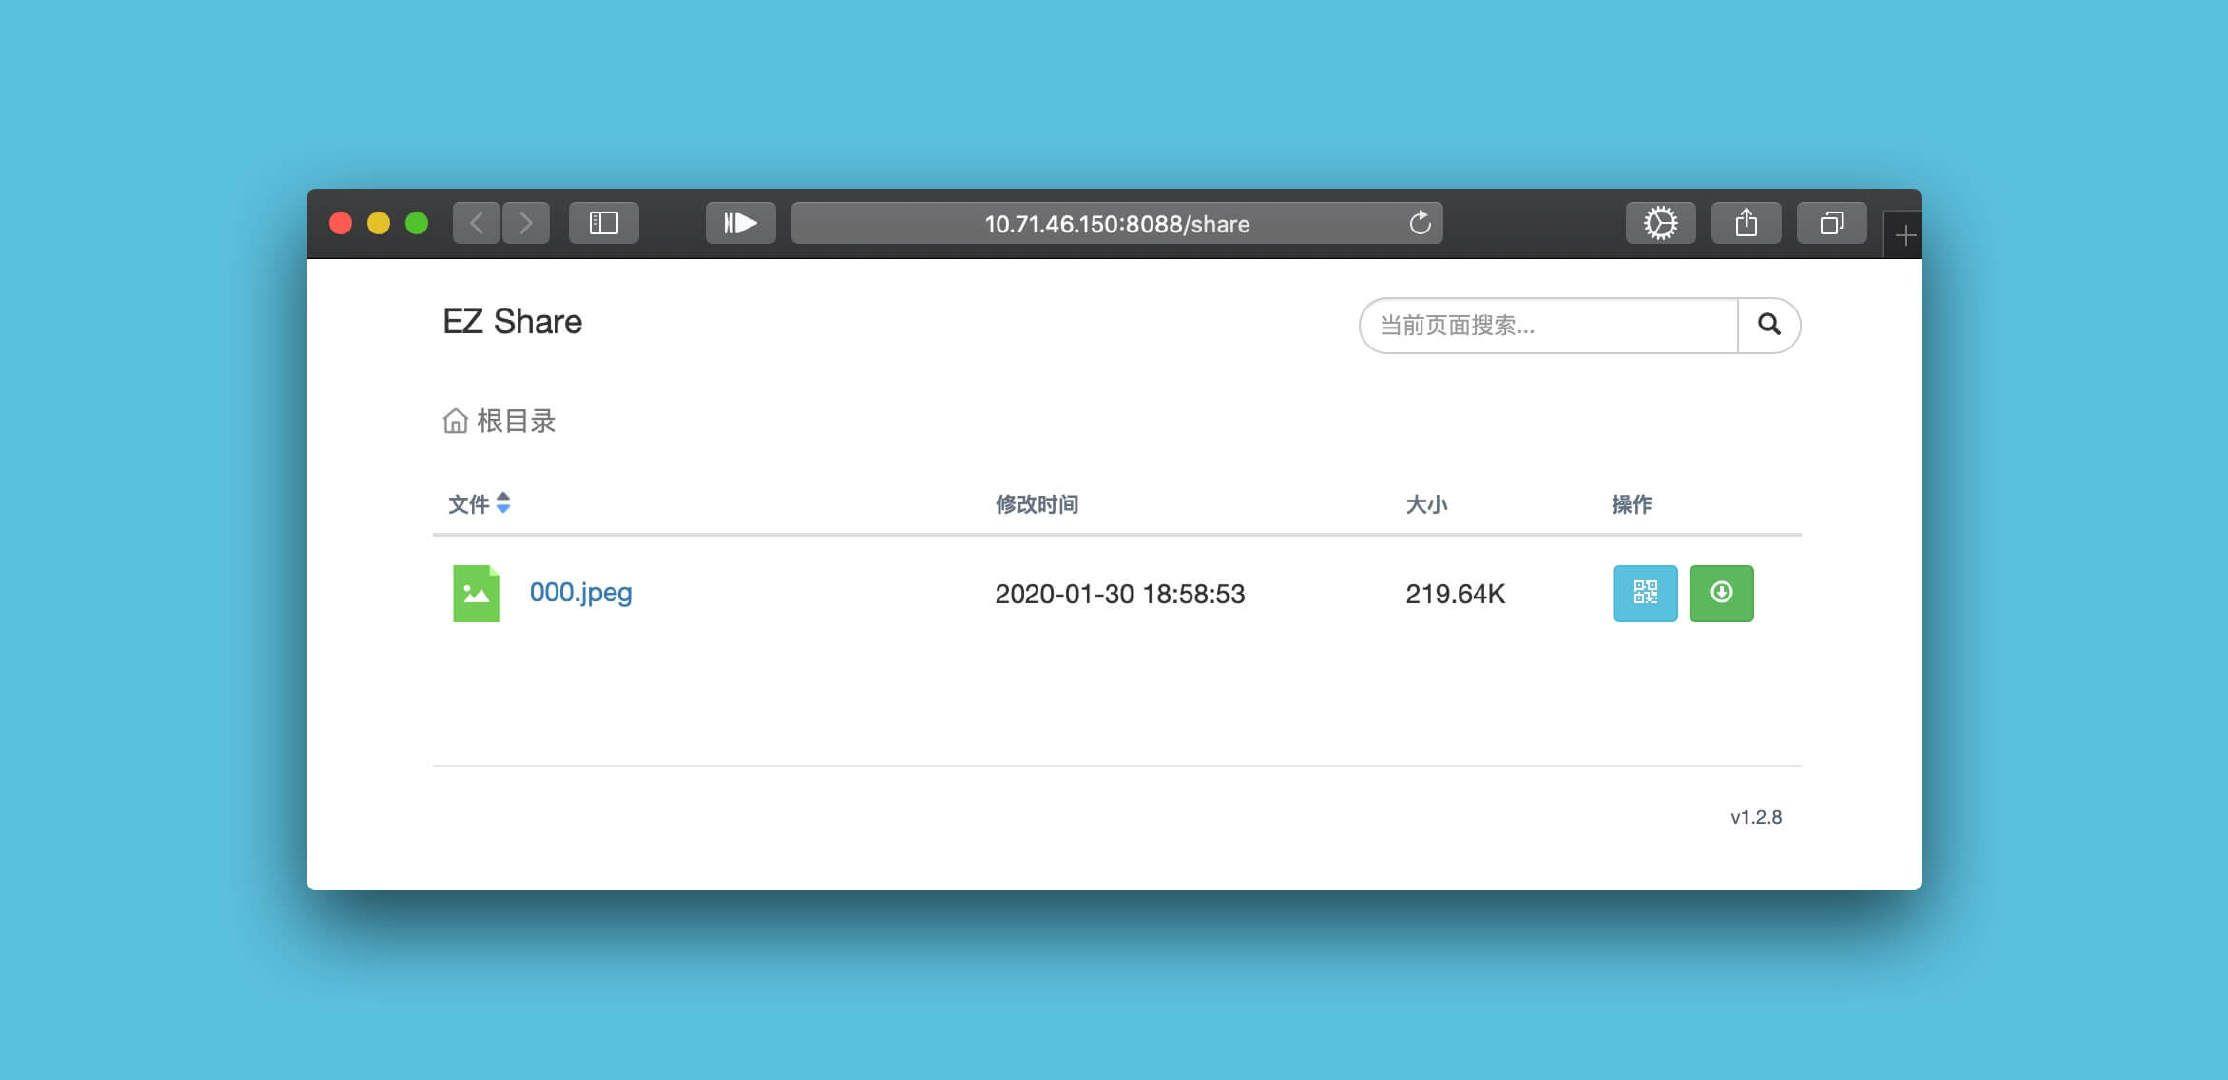 5f7dfa2d88204 - Mac | 极速分享:分享文件和照片,文件分享工具。